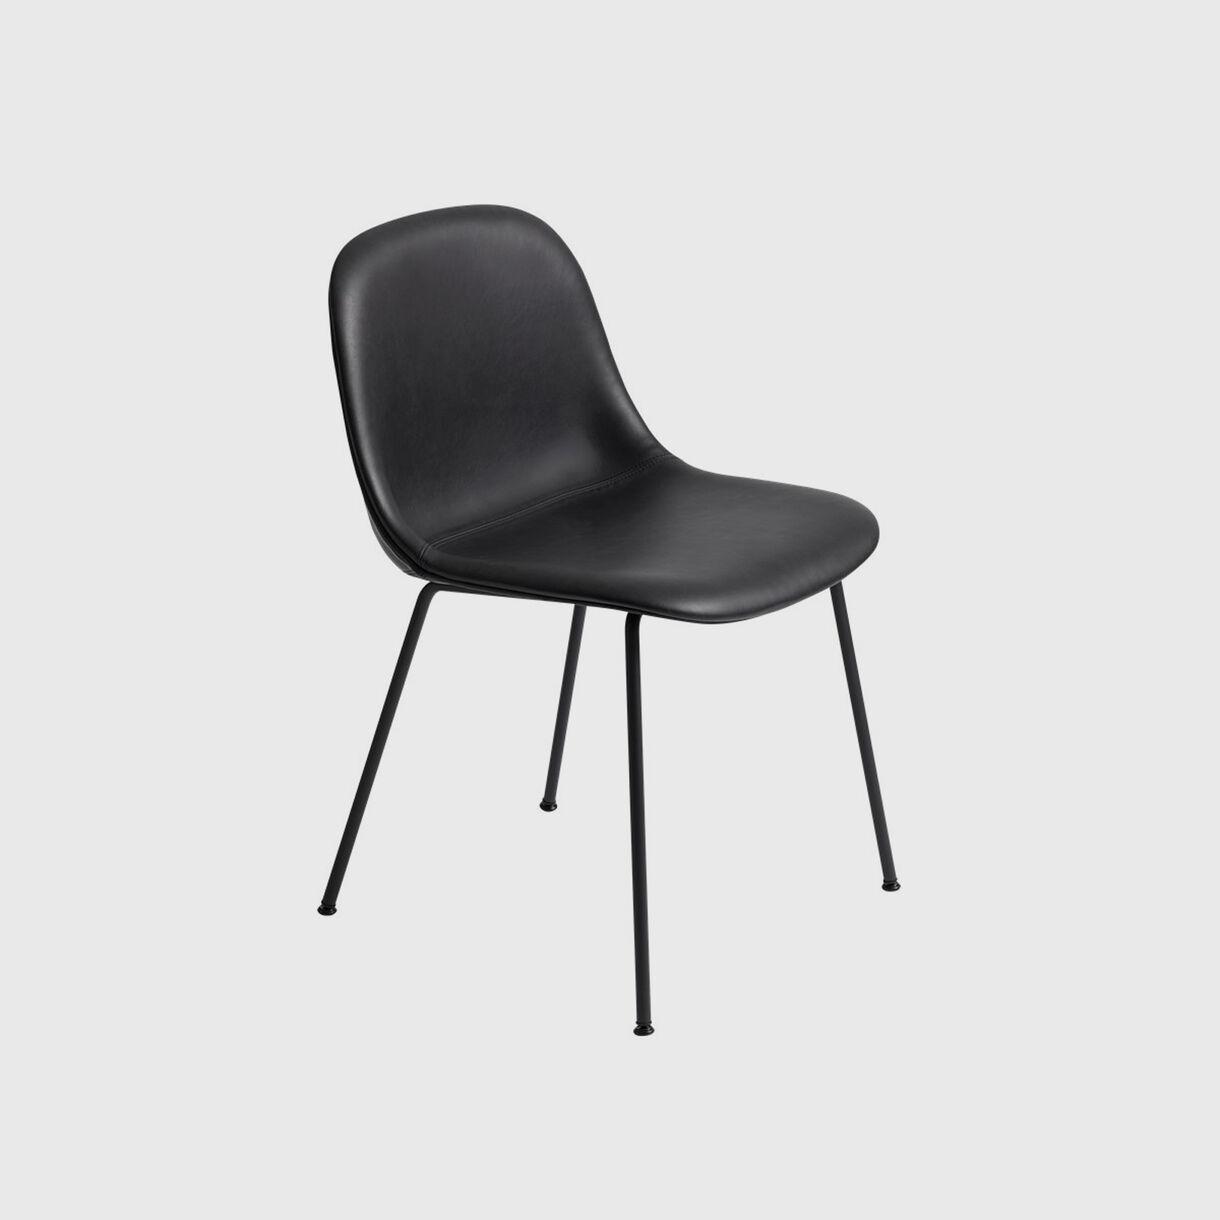 Fiber Side Chair Tube Base, Upholstered, Black Leather